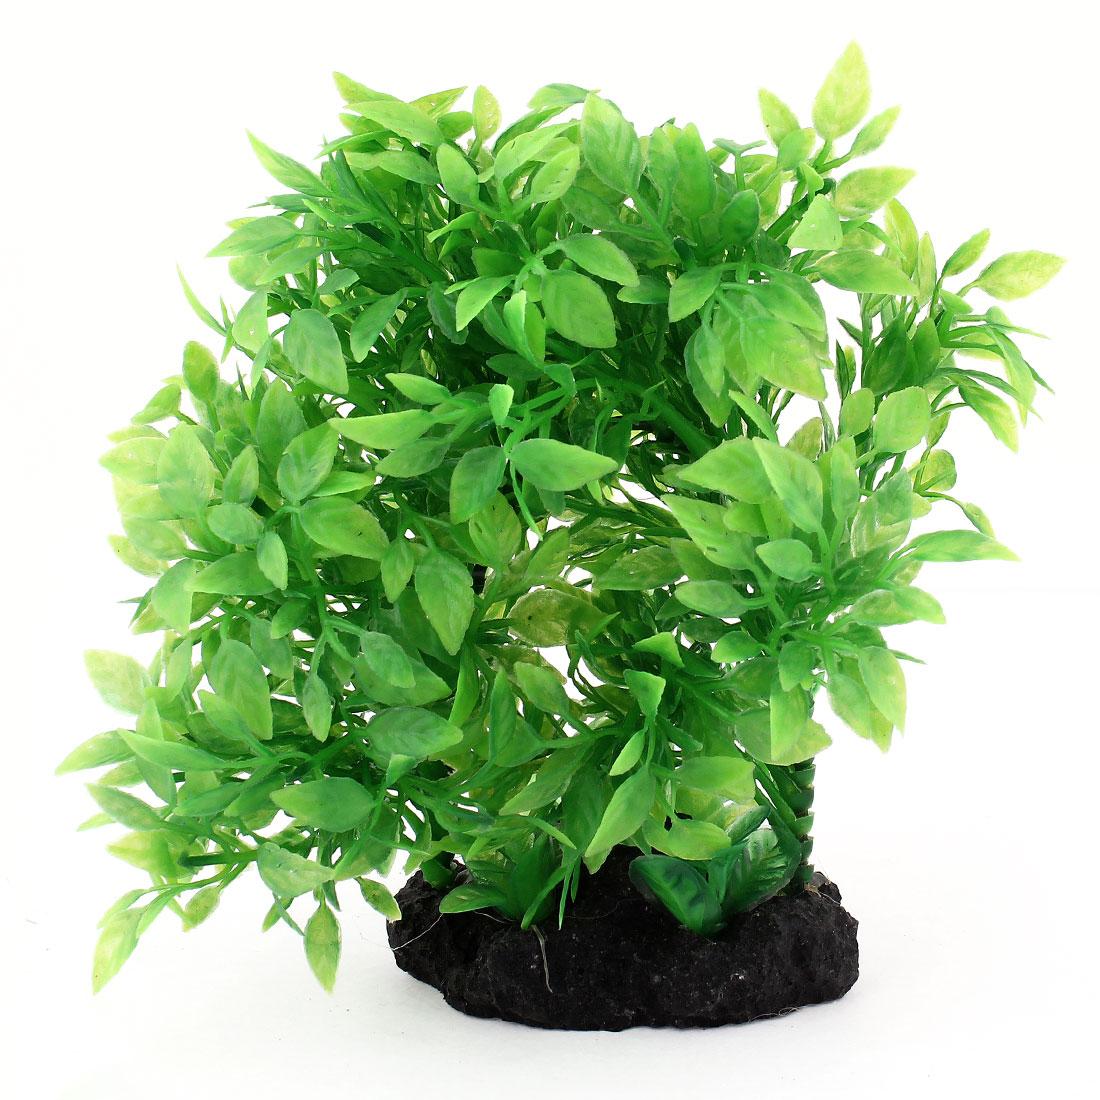 "Ceramic Base 5.9"" High Green Emulational Plastic Plants Grass for Fish Tank"